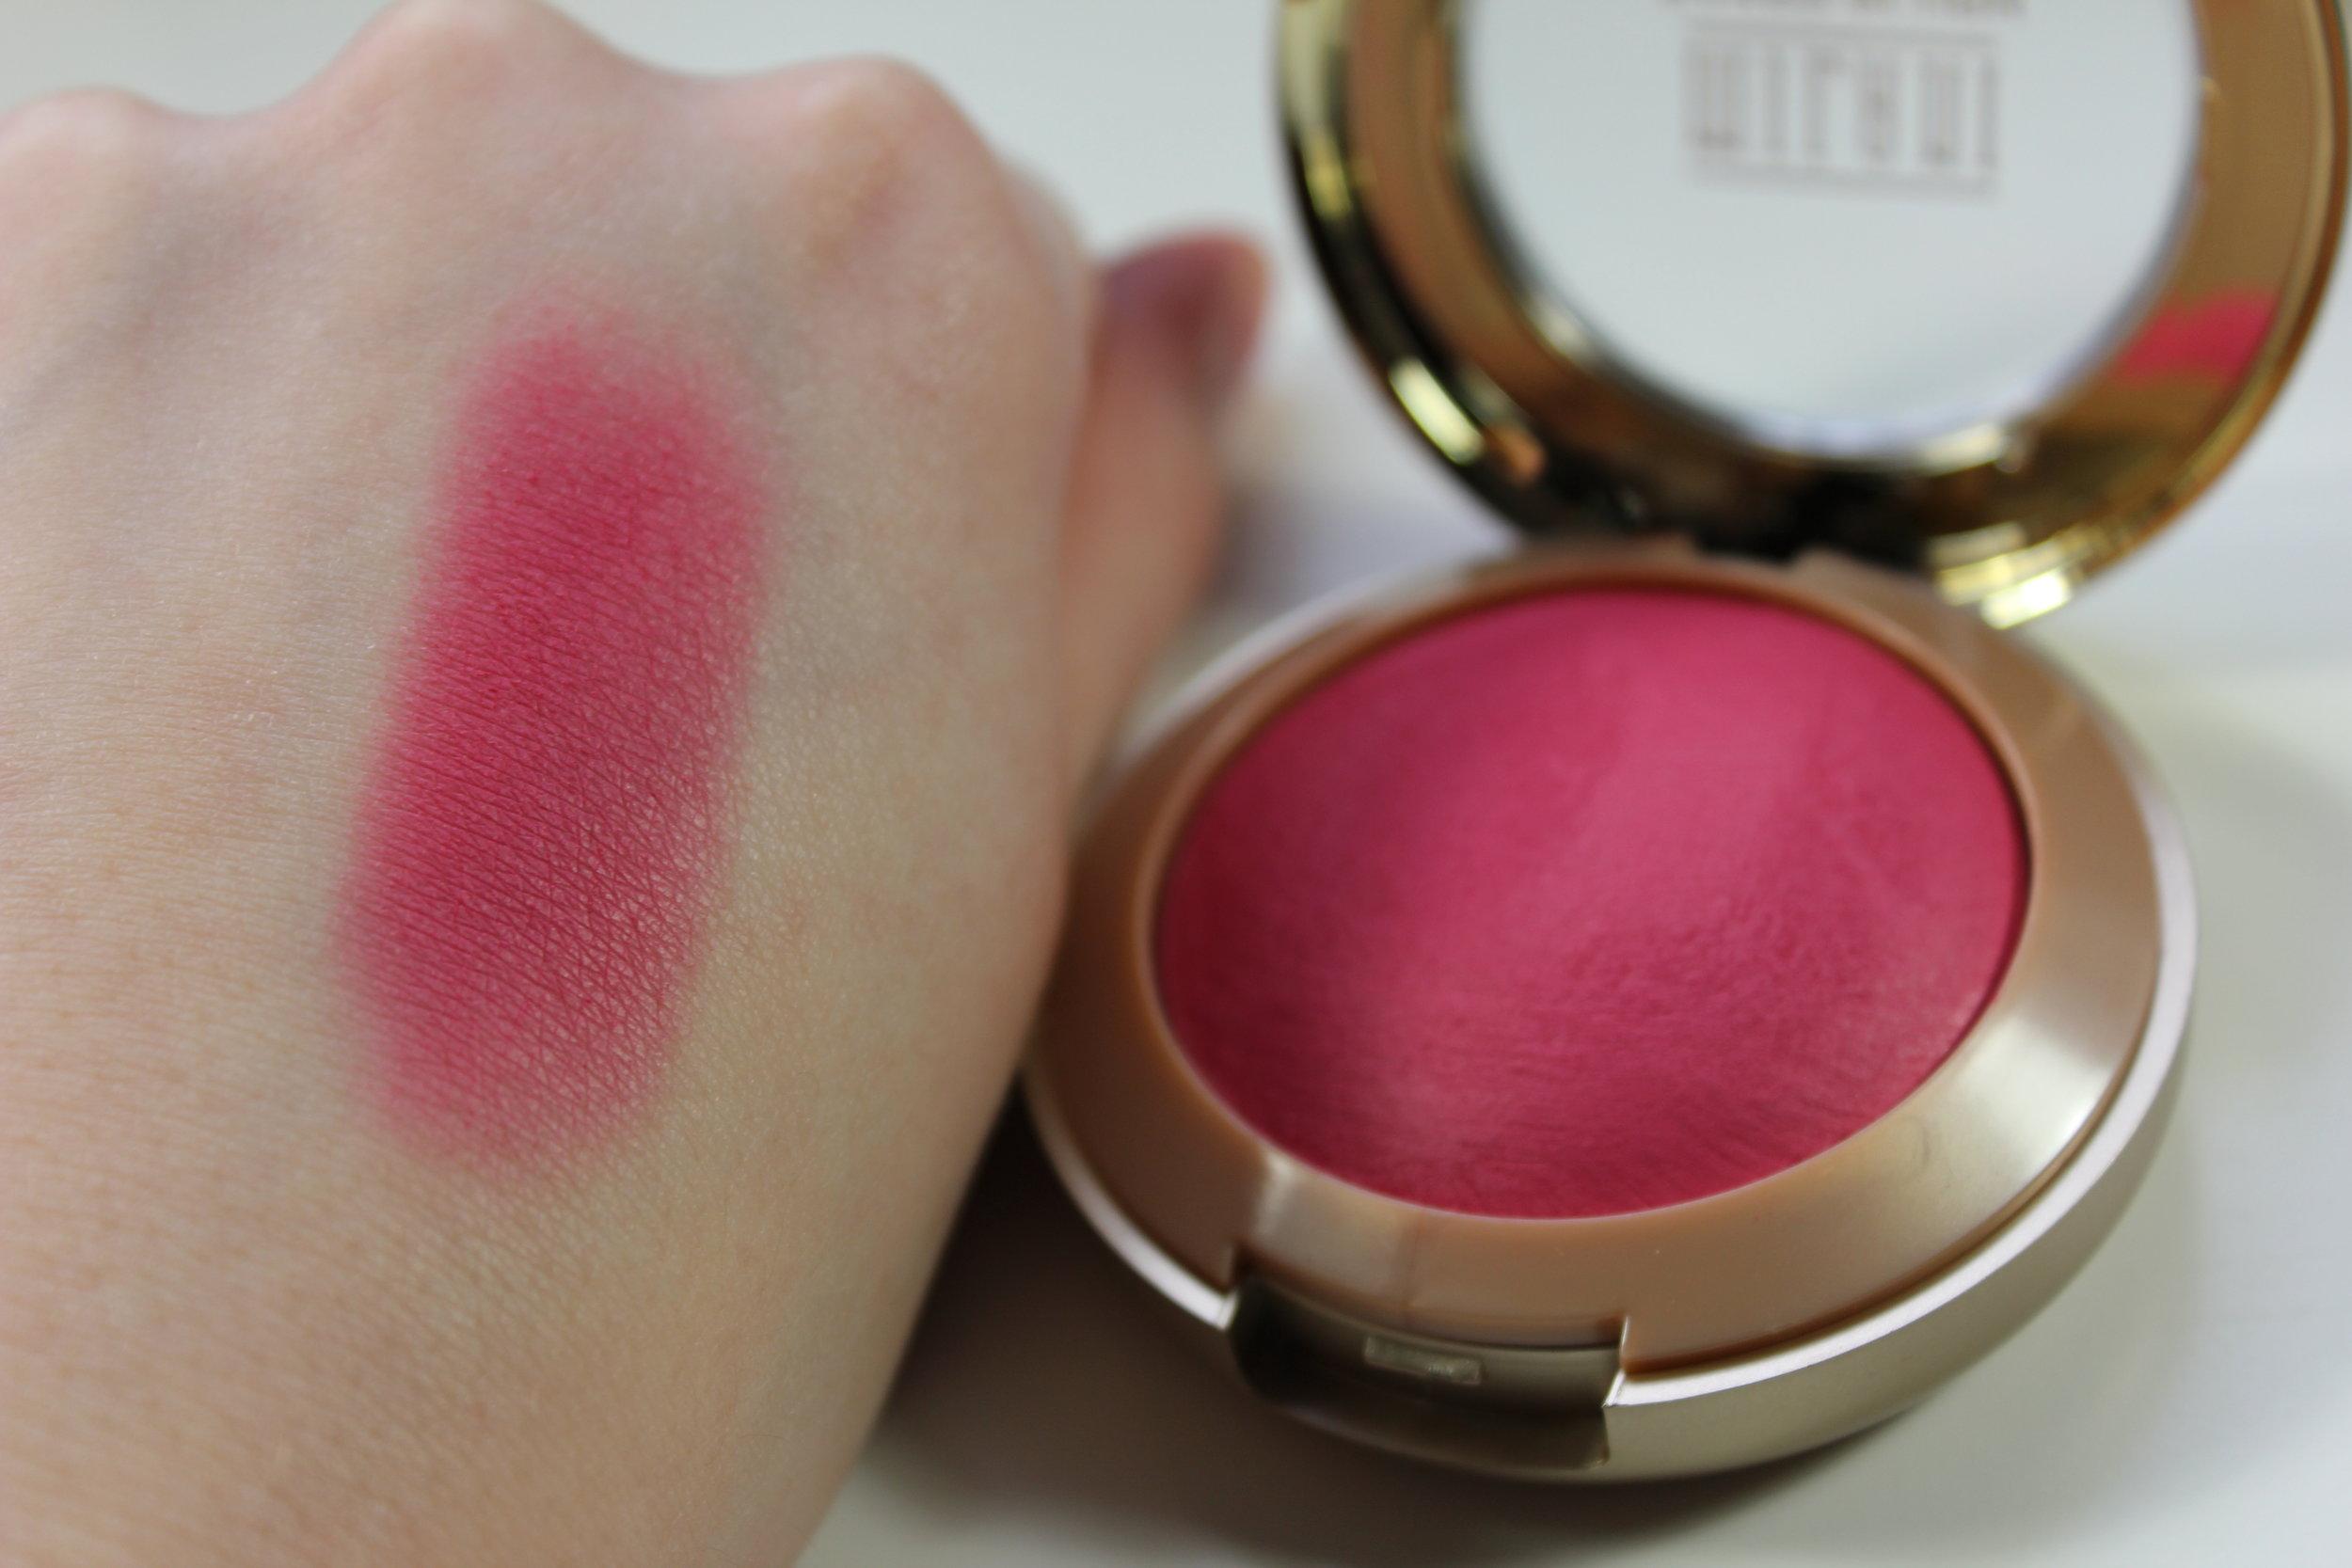 milani 39 s matte baked blush in bella rosa the makeup affair. Black Bedroom Furniture Sets. Home Design Ideas